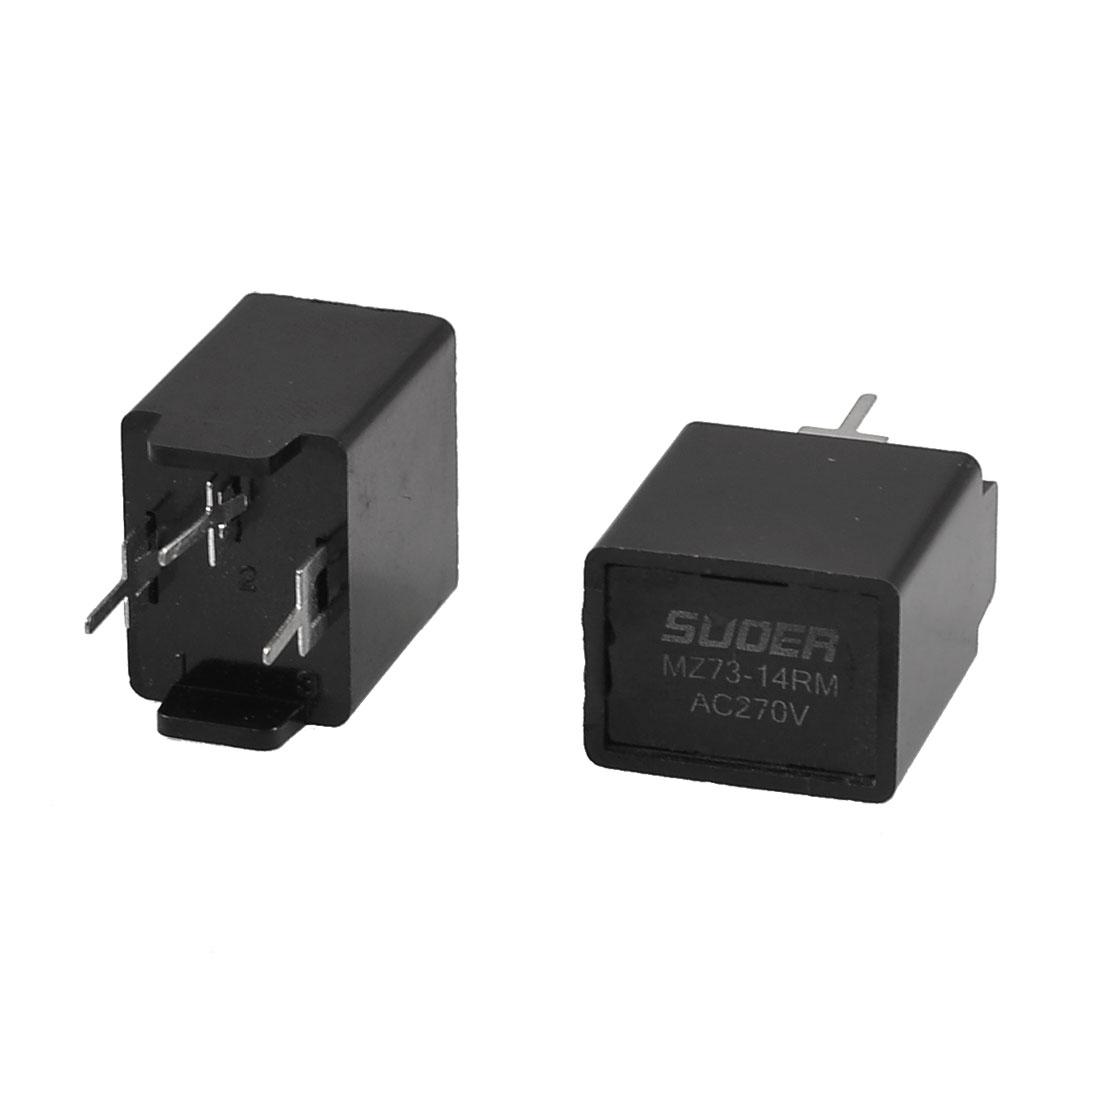 MZ73-14RM 1.8K Ohm AC 270V 3 Pin Black Degaussing Resistor CRT 2 Pcs